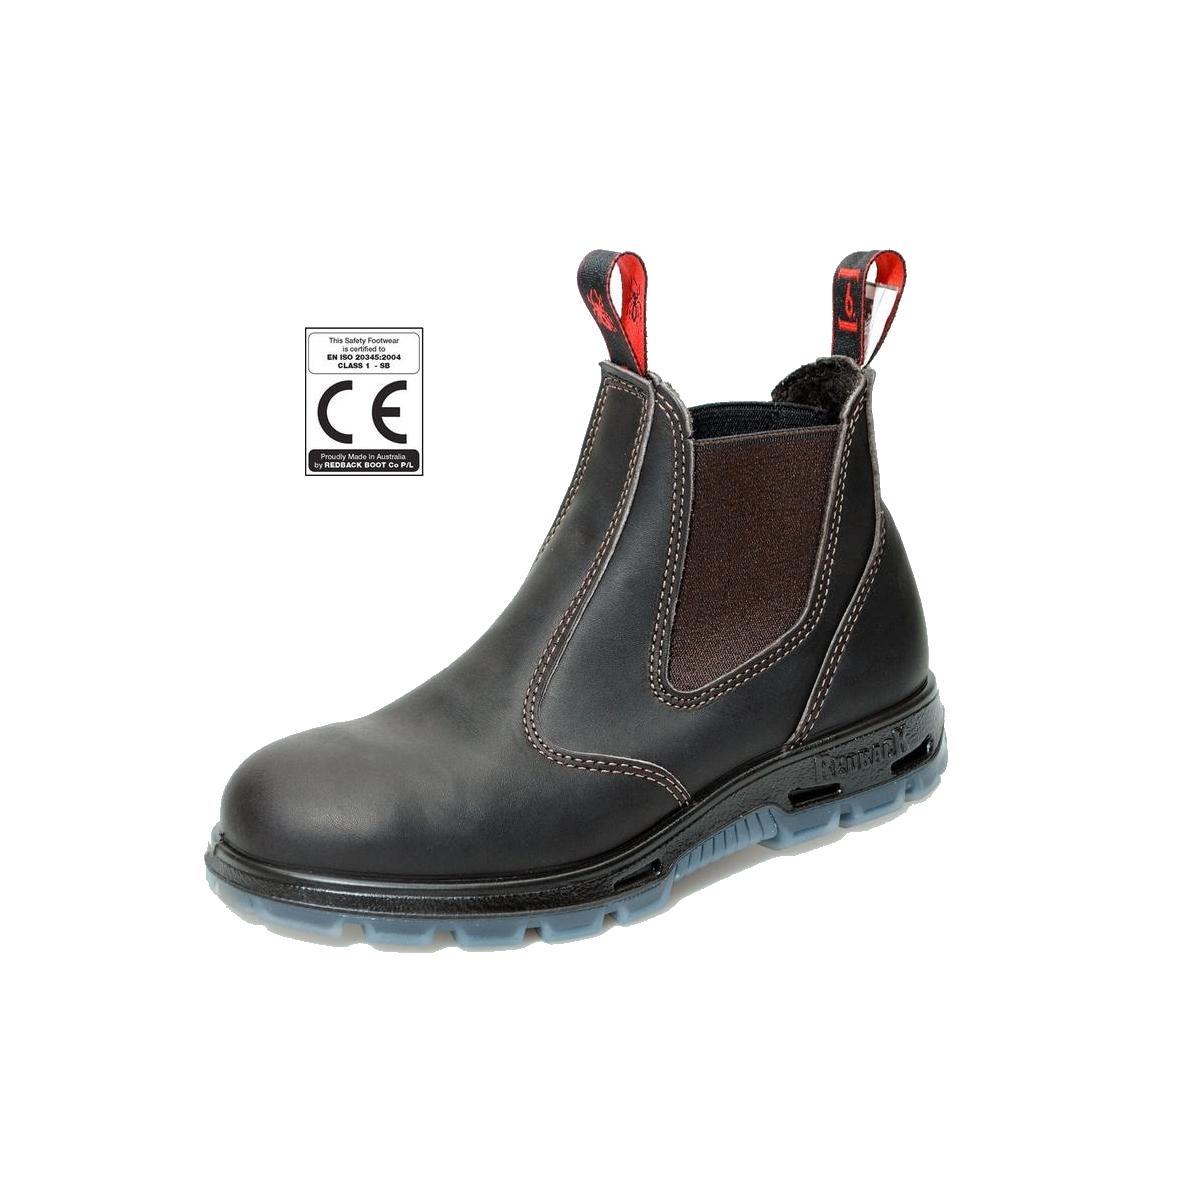 Redback Safety Boots | SJH Machinery